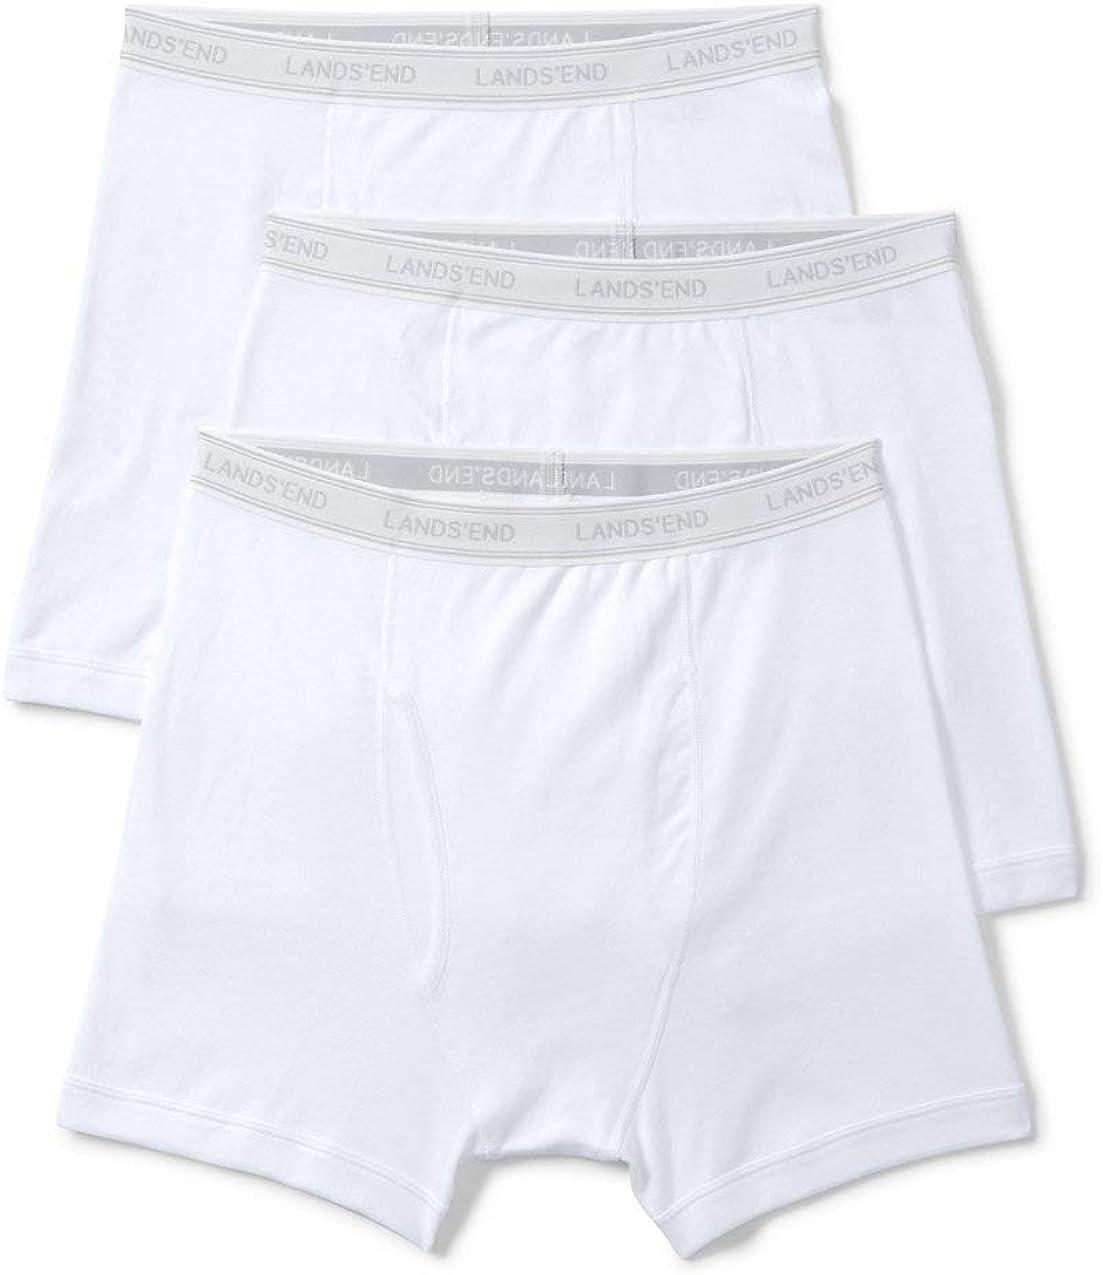 Lands' End Men's Knit Underwear 3 Pack - Boxer Briefs